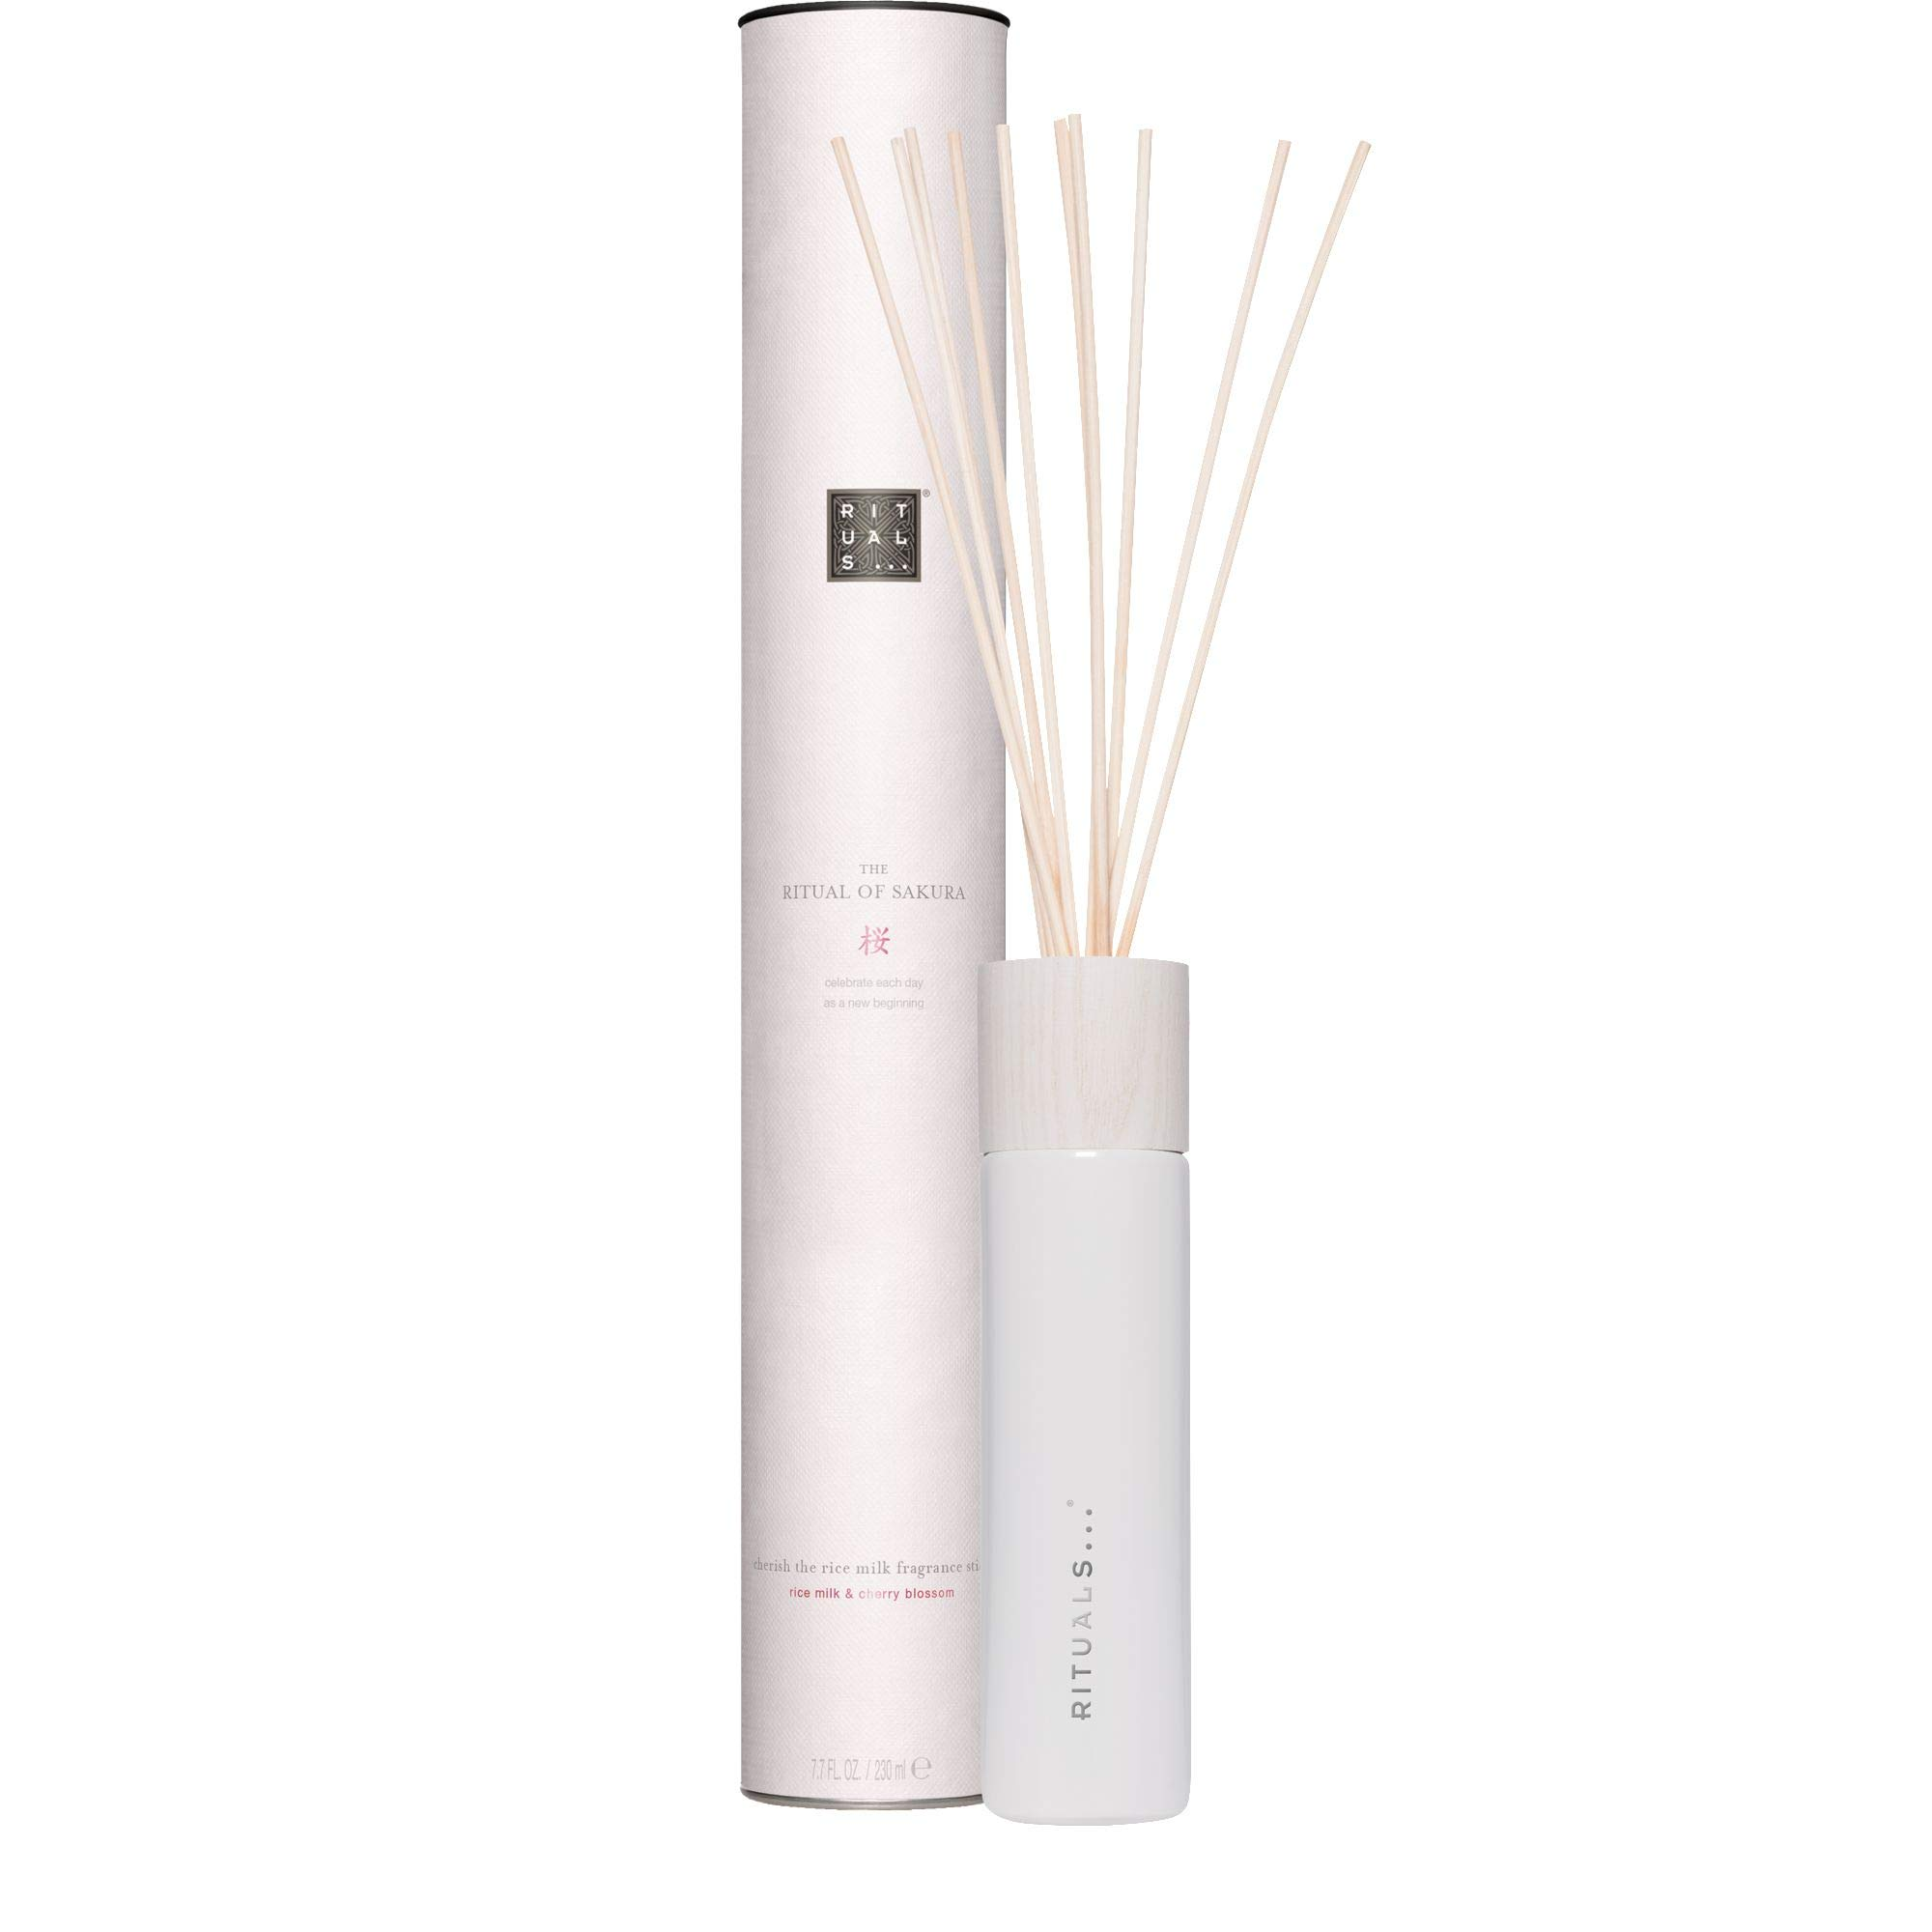 RITUALS The Rituals of Sakura Large Fragrance Sticks, 7.7 fl. oz